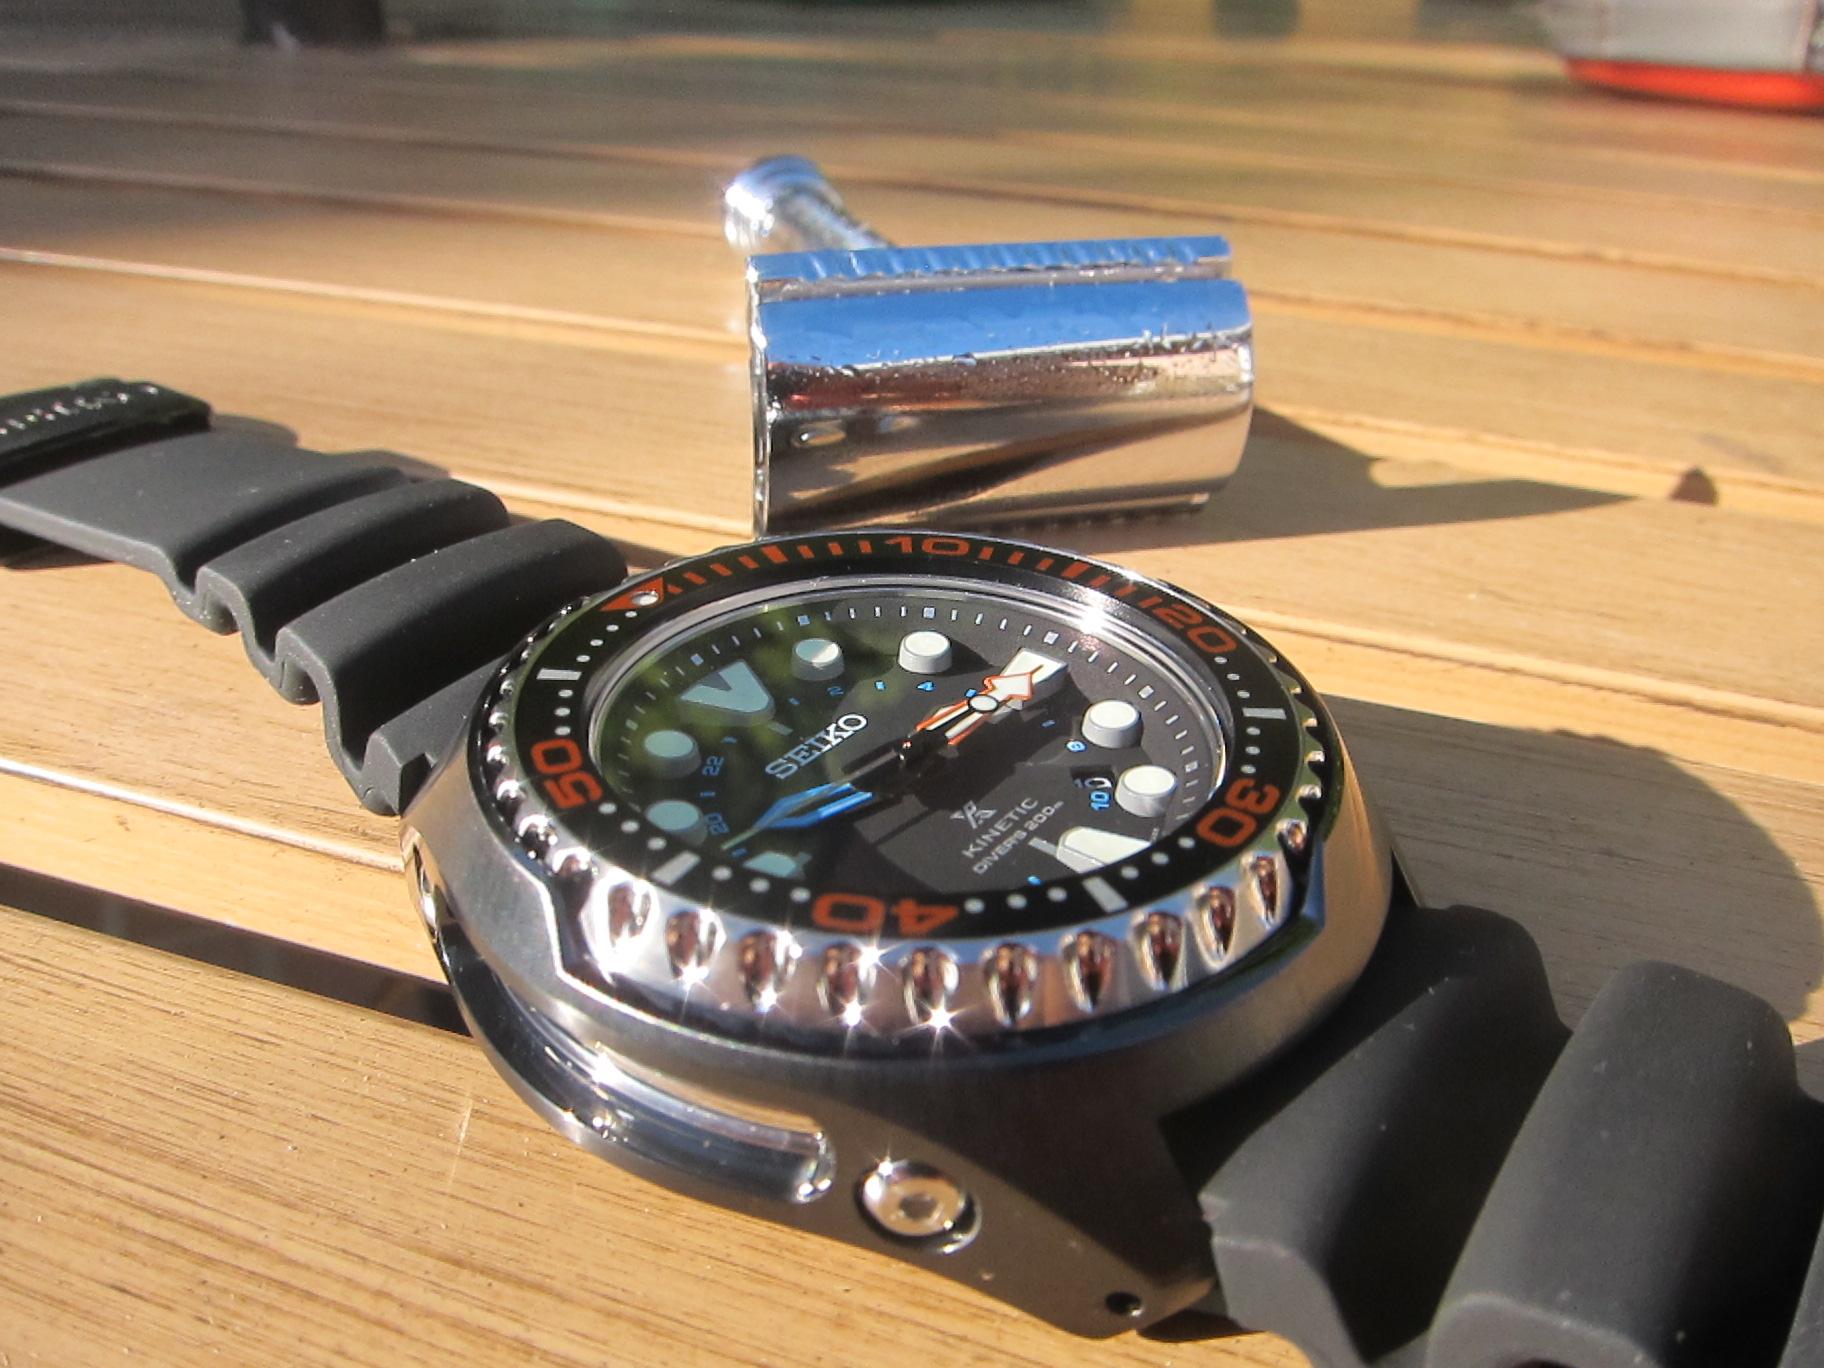 Herculodge: First Look: Seiko Kinetic Diver SUN023